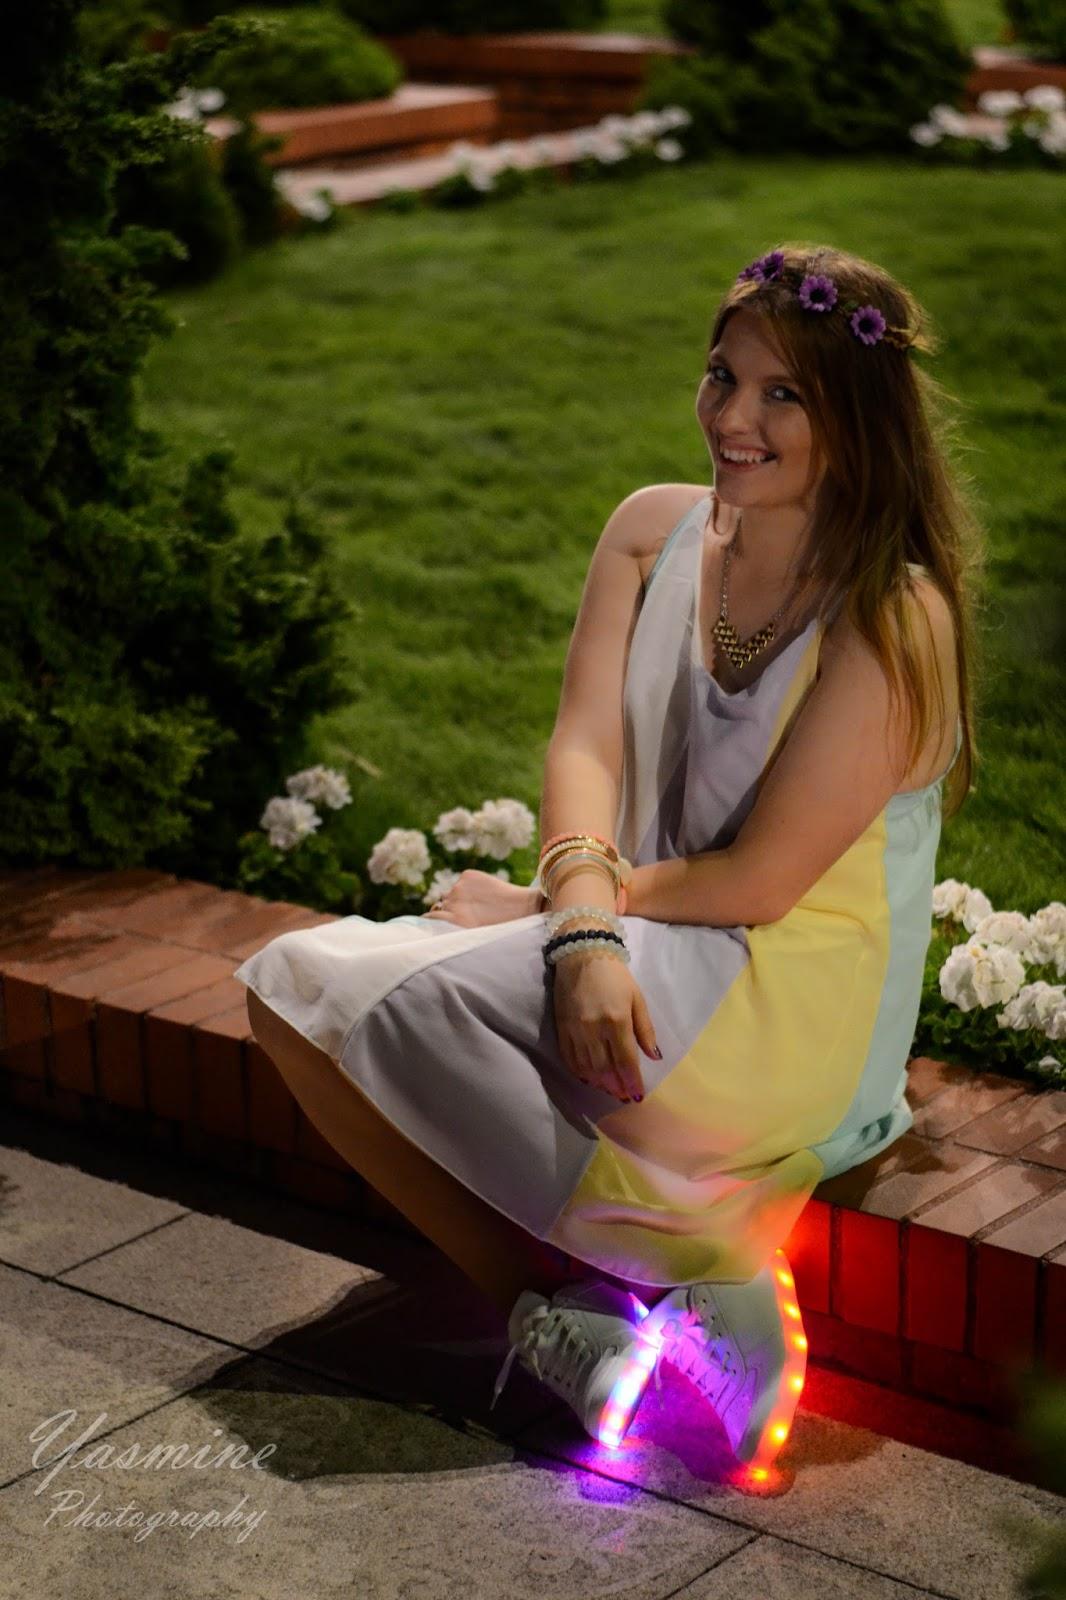 stylizacje festiwalowe ze smeakersami sneakersy disco light renee recenzja melodylaniella lookbook fashion flowers